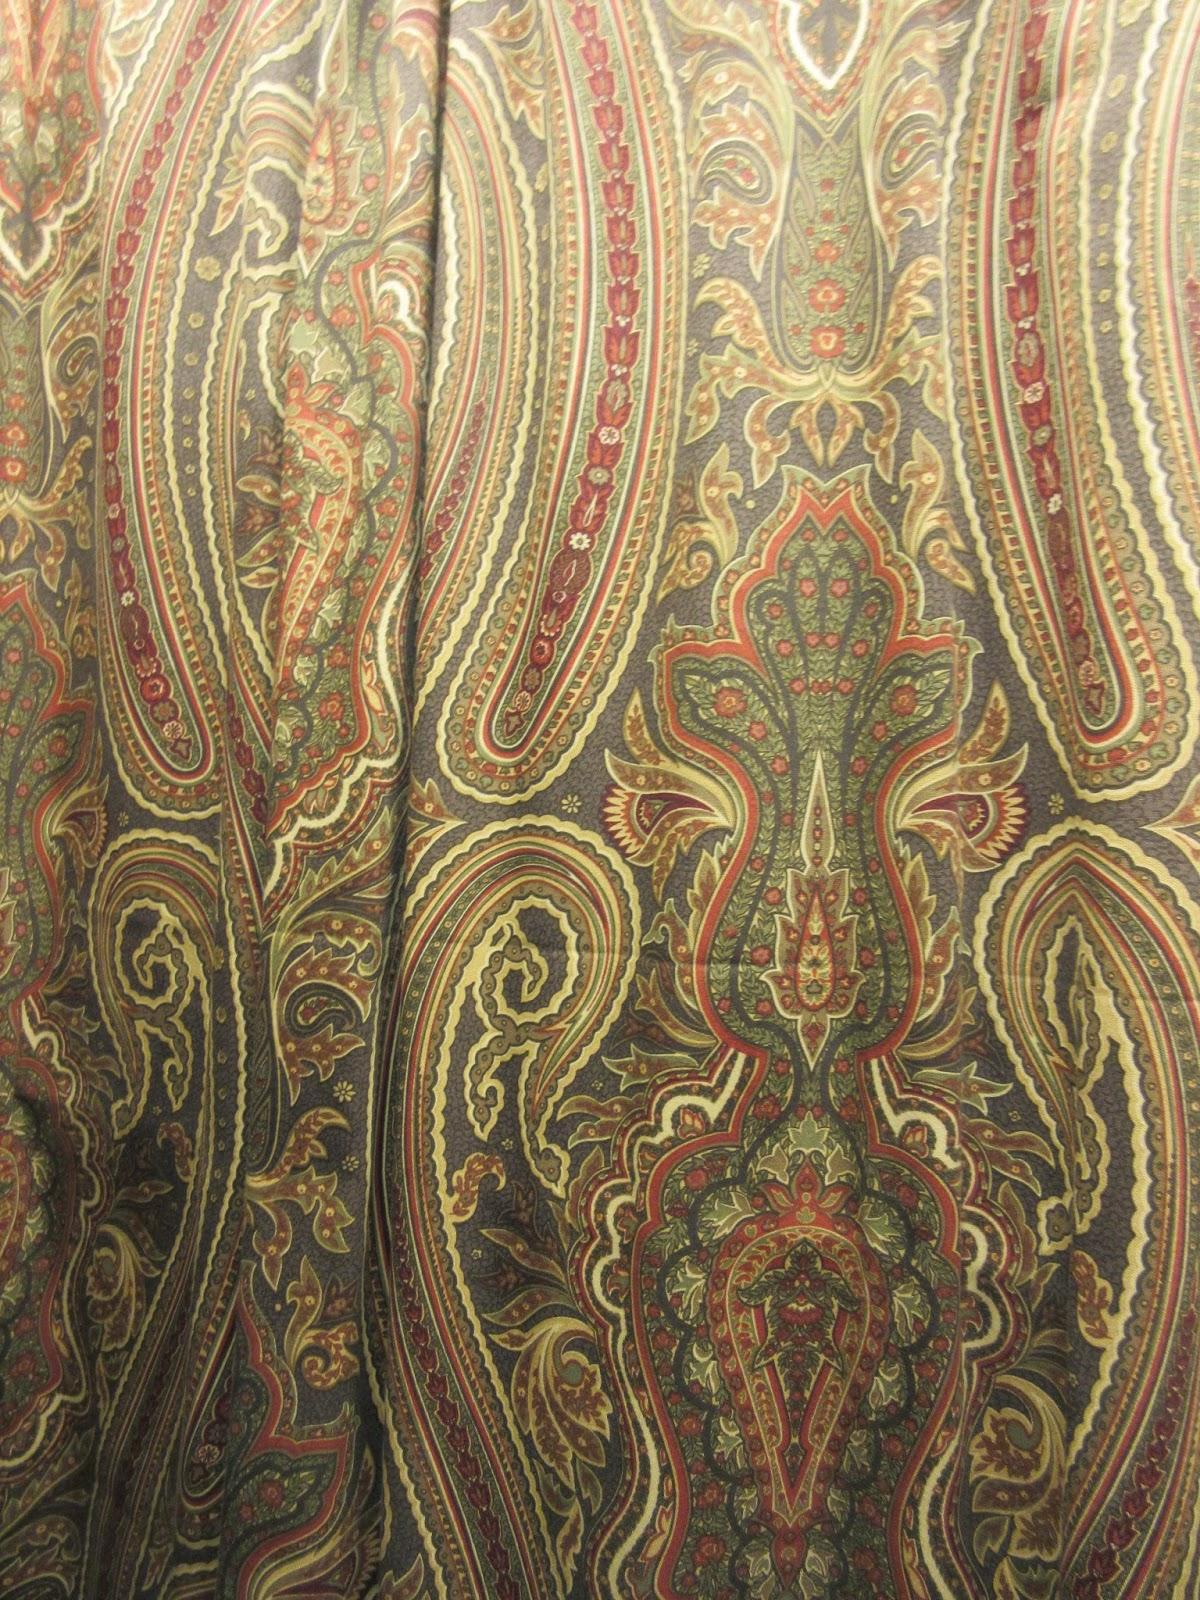 Annaline Interior Design Wzory Paisley A Aran Acja Wn Trz